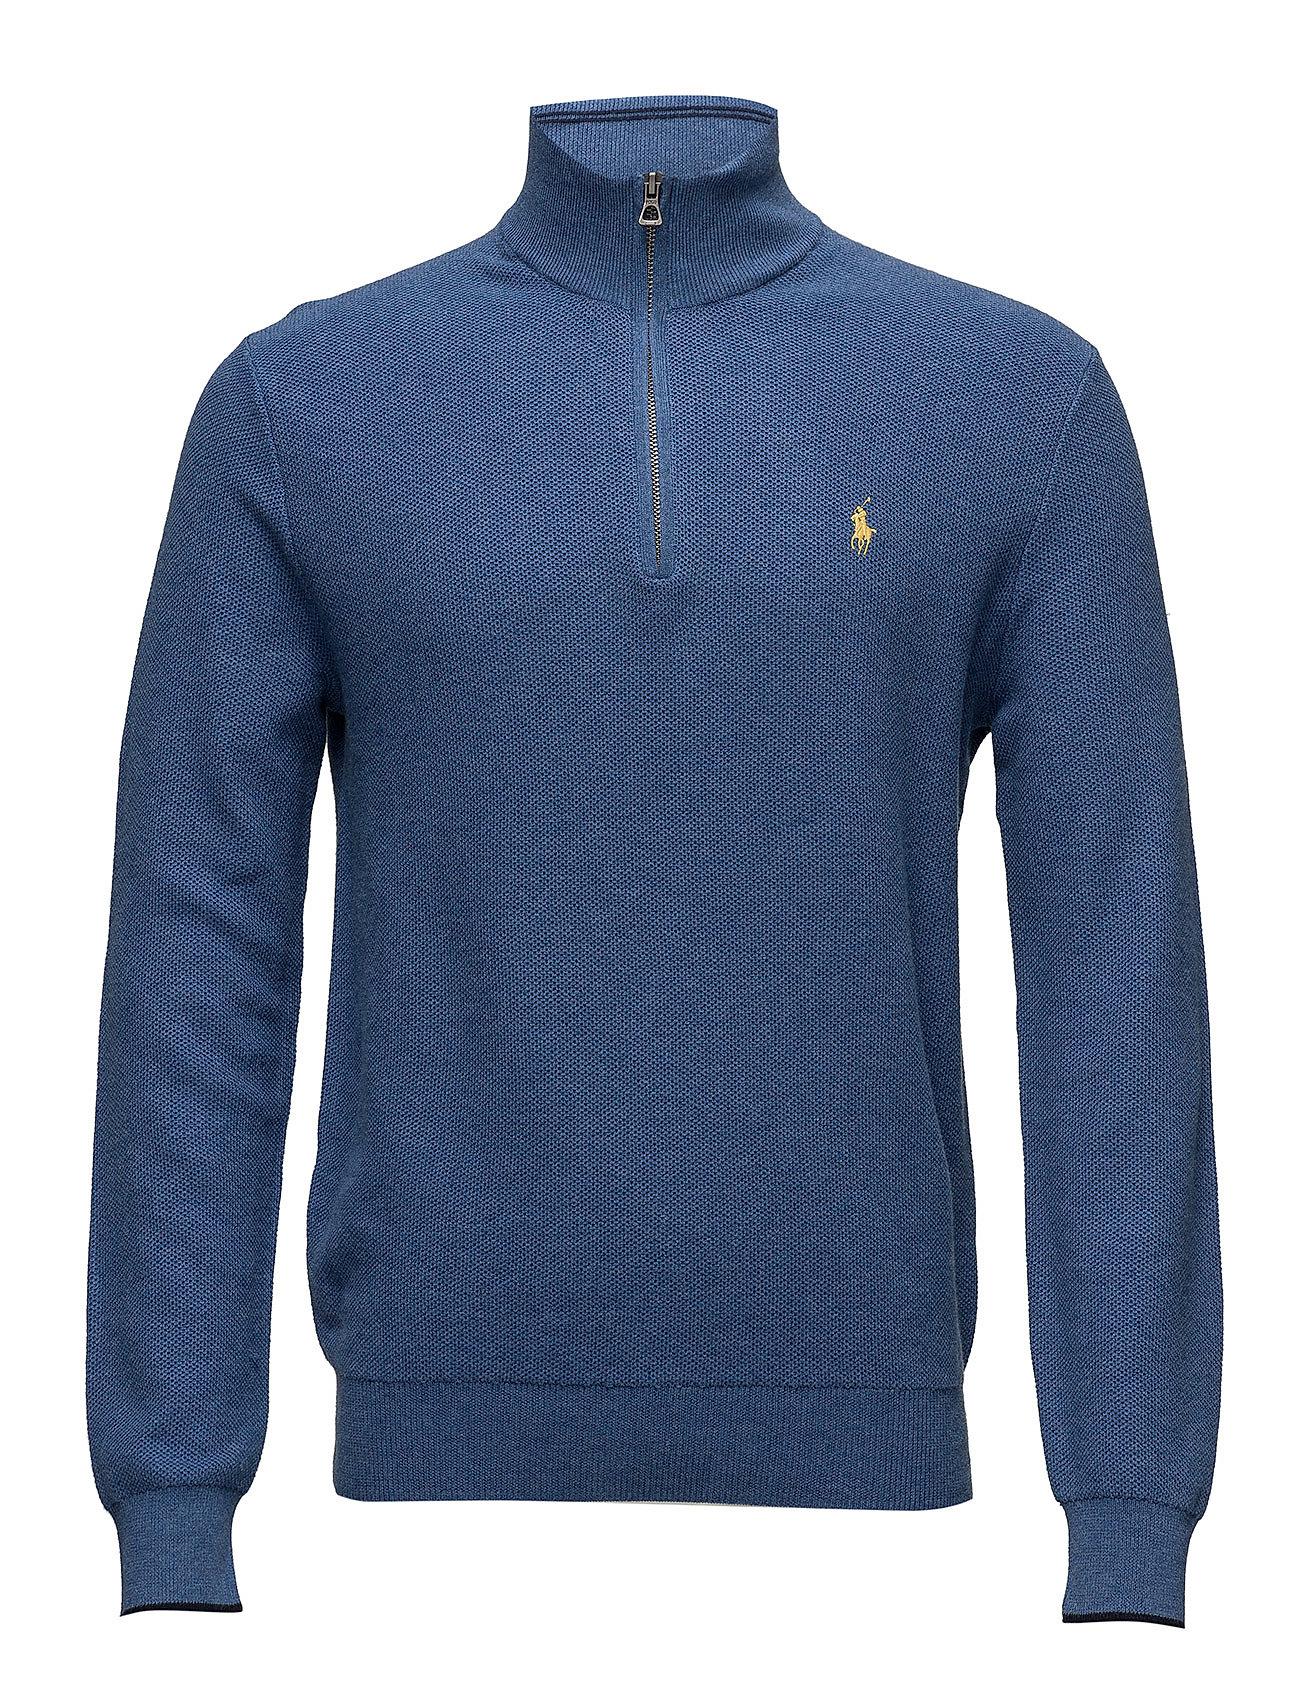 Polo Ralph Lauren Cotton Half-Zip Sweater - ROYAL HEATHER